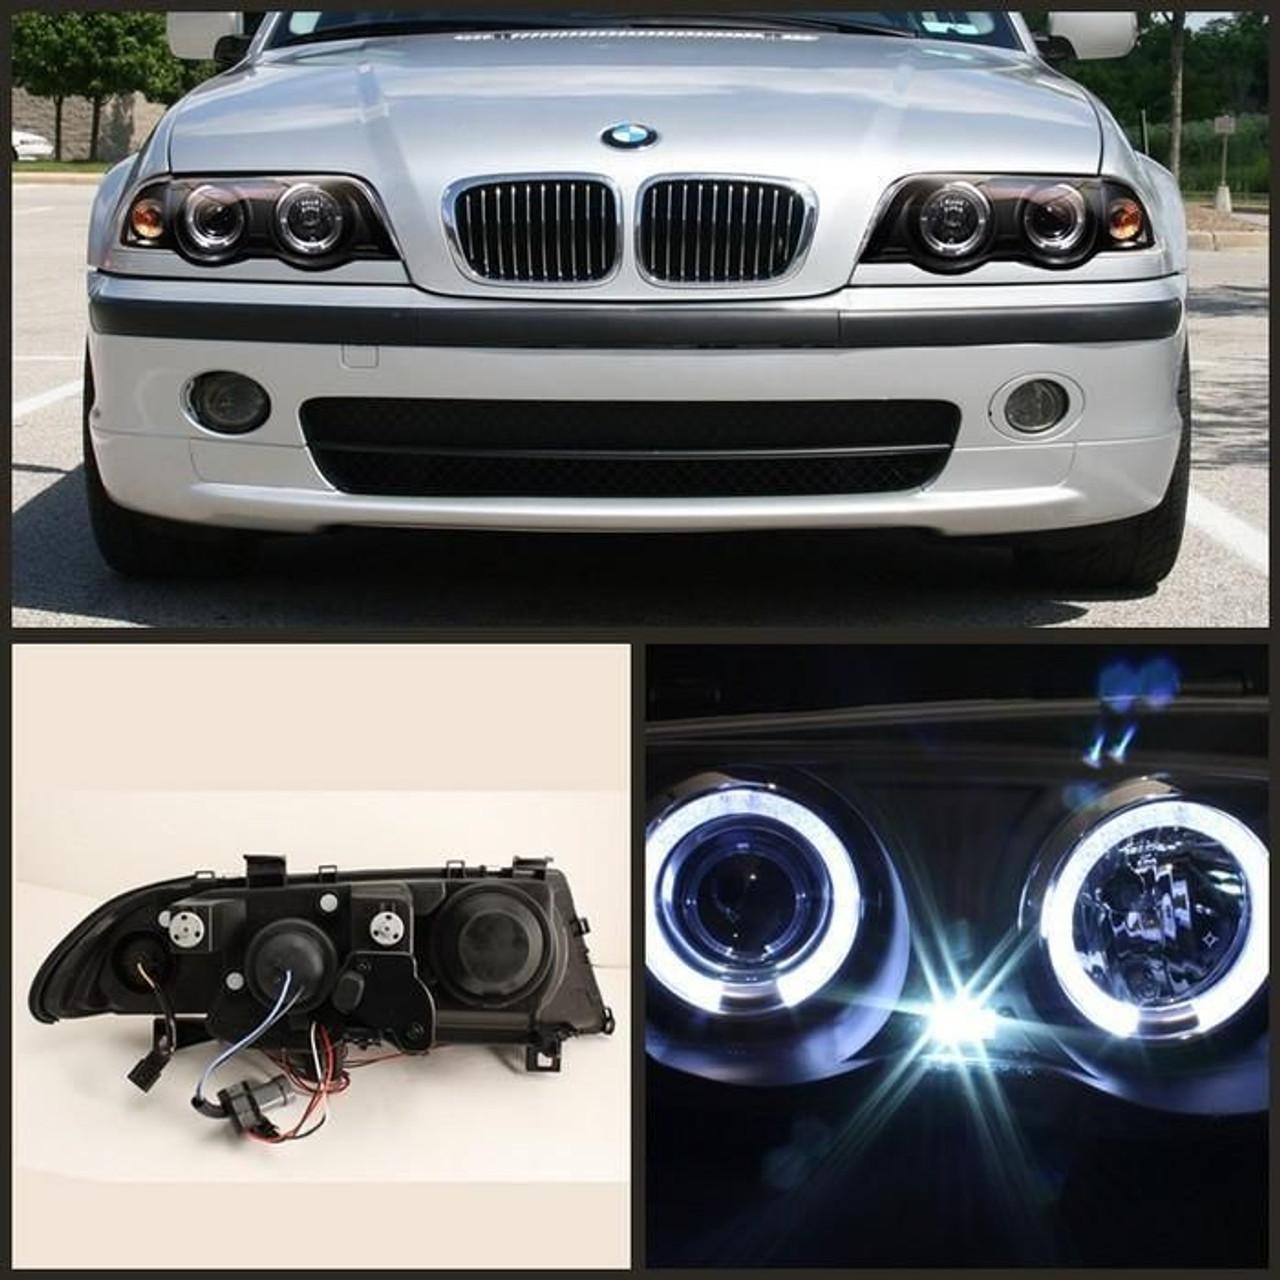 Spyder Black Projector Led Halo Headlights For 1999 2001 E46 Bmw 325i 328i 330i Sedan